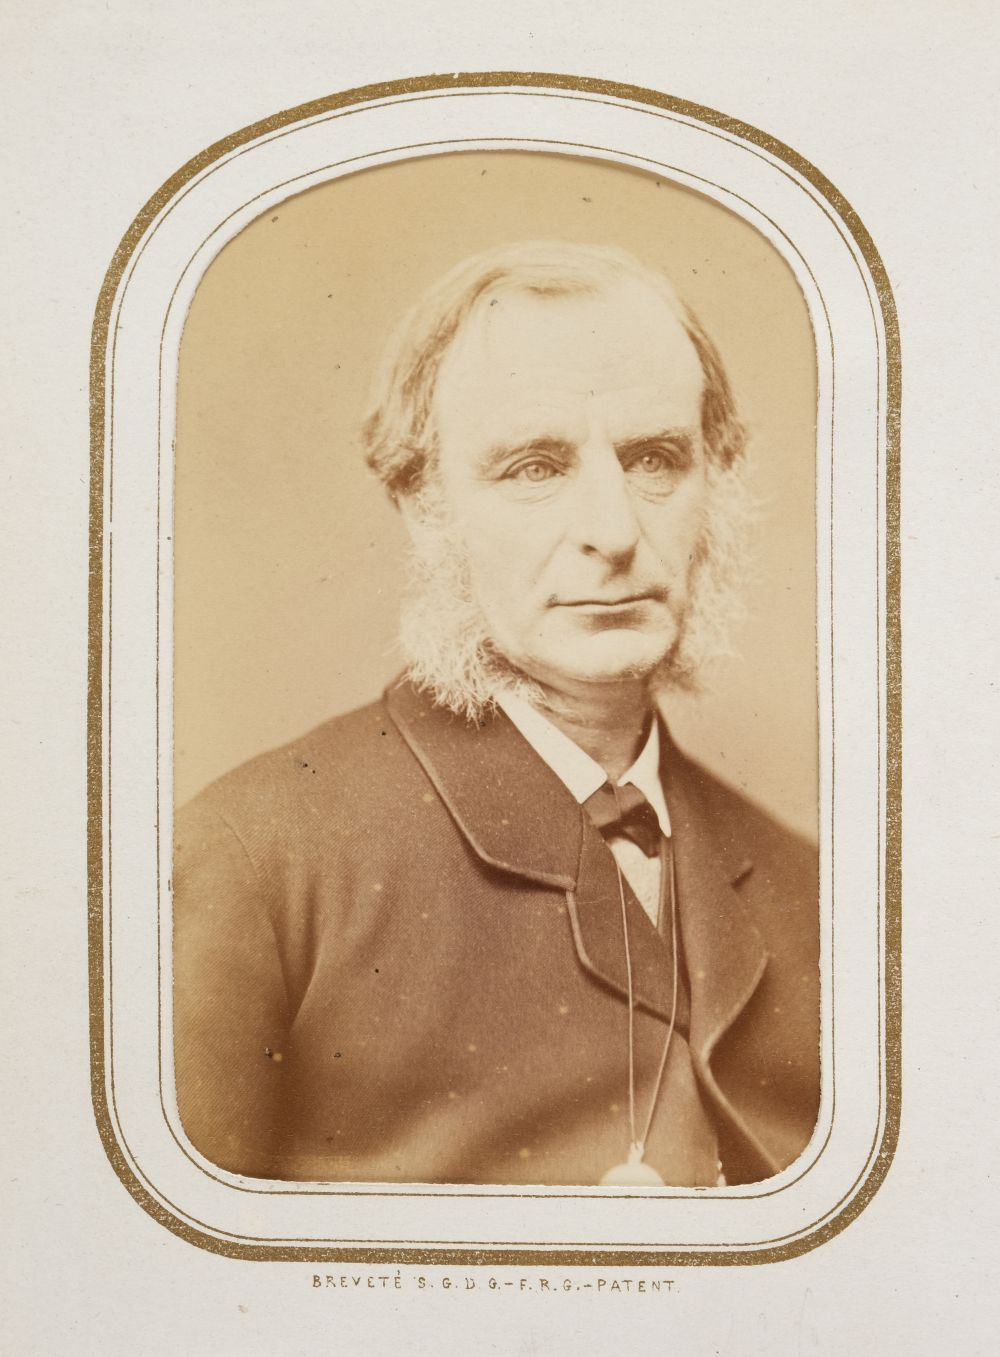 * Cartes de visite. A cartes-de-visite album, c. 1860s/1880s - Image 17 of 18